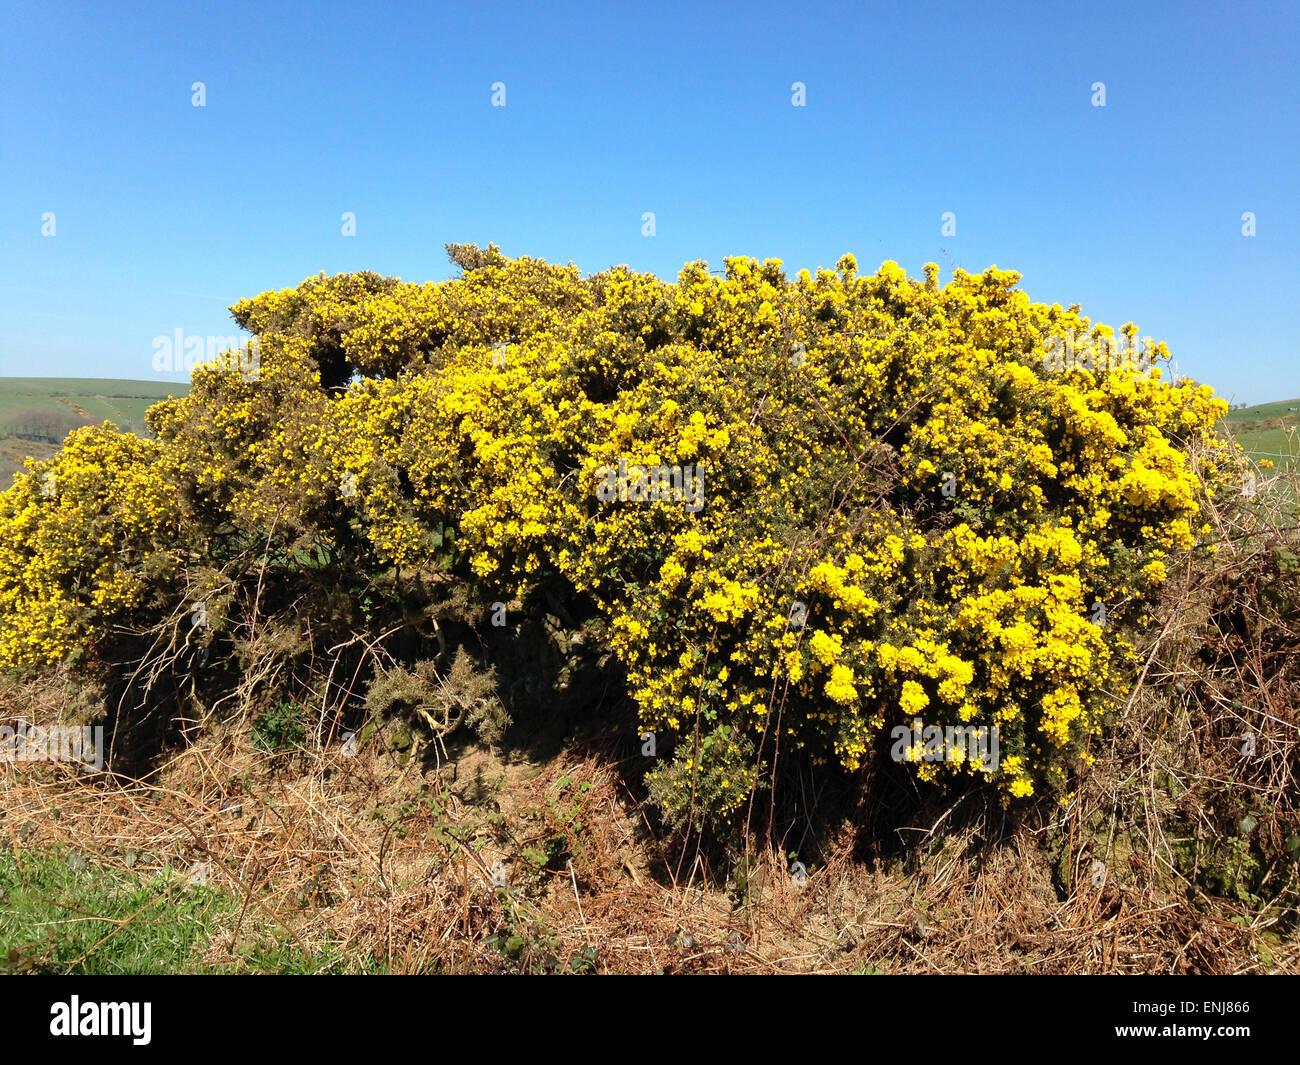 Golden Gorse Bush Stock Photo Royalty Free Image